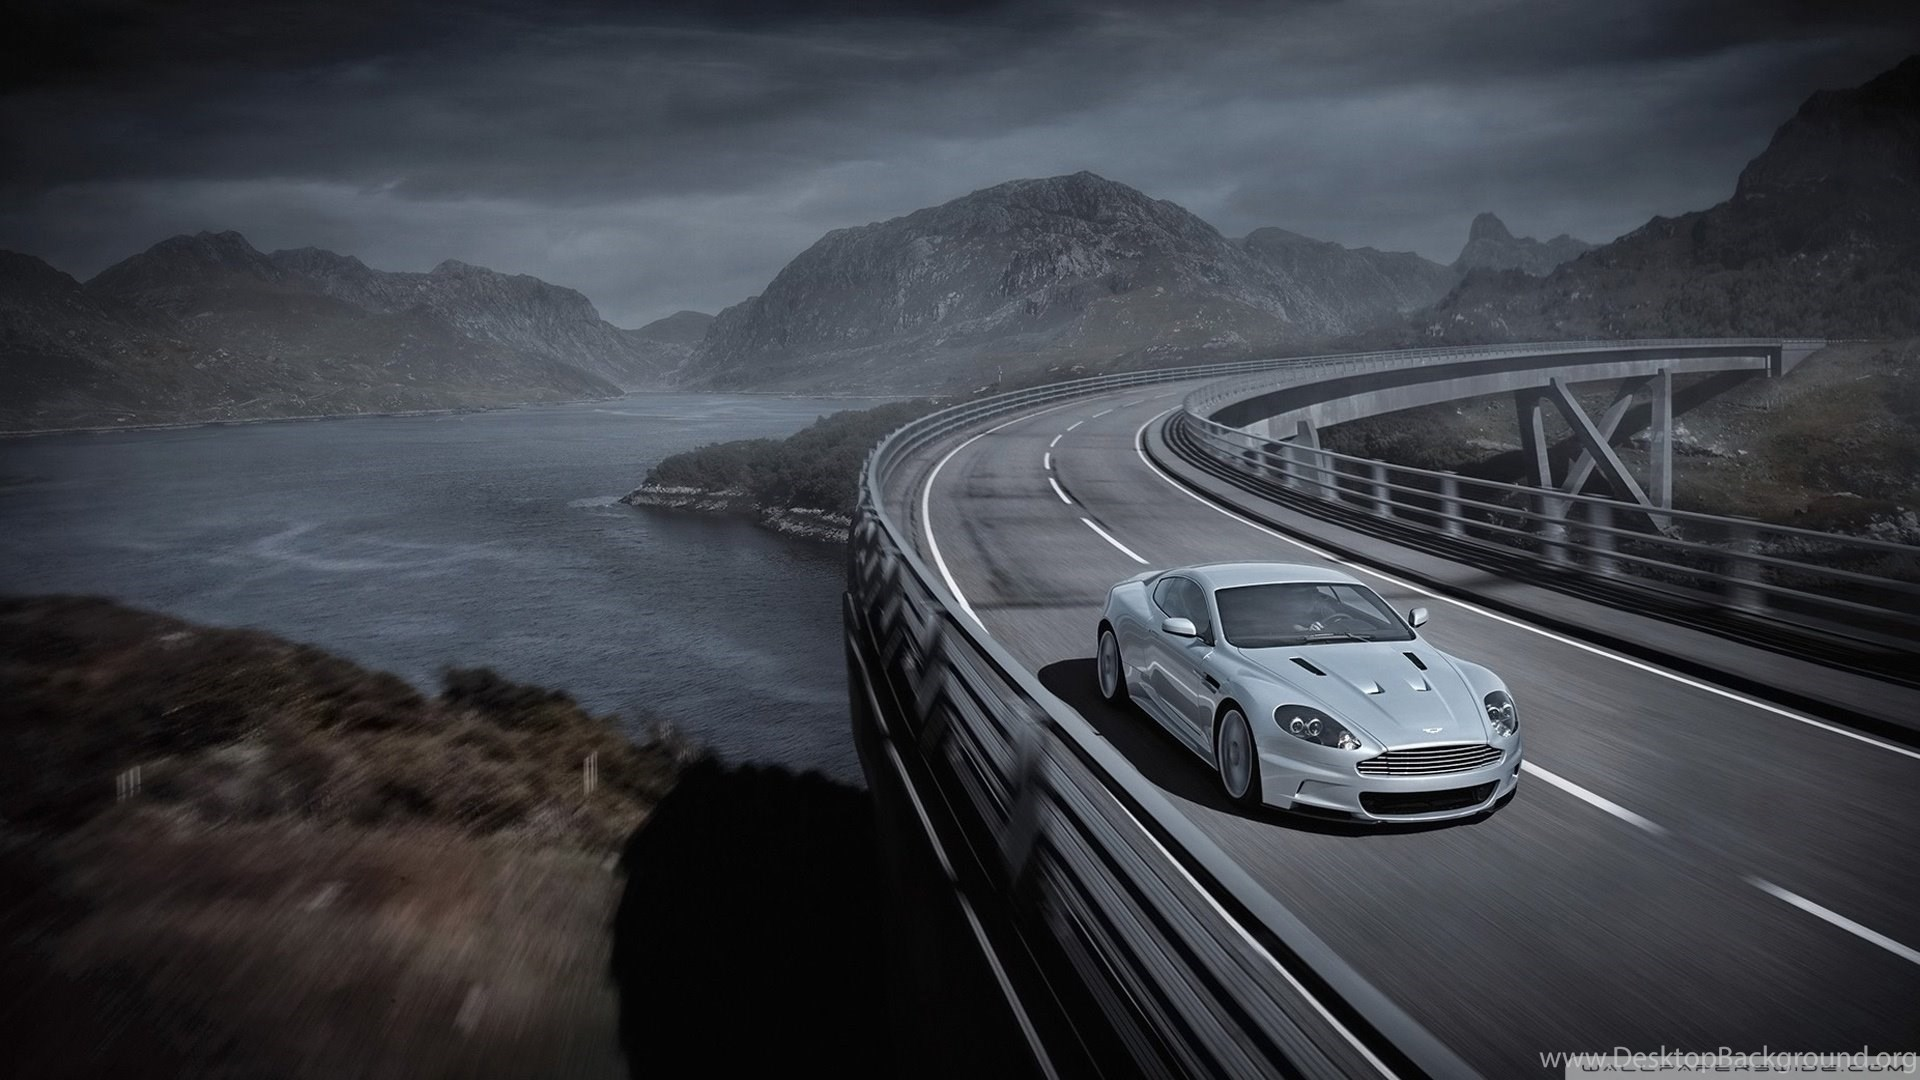 Download Aston Martin Dbs 10 Wallpapers 1920x1080 Desktop Background